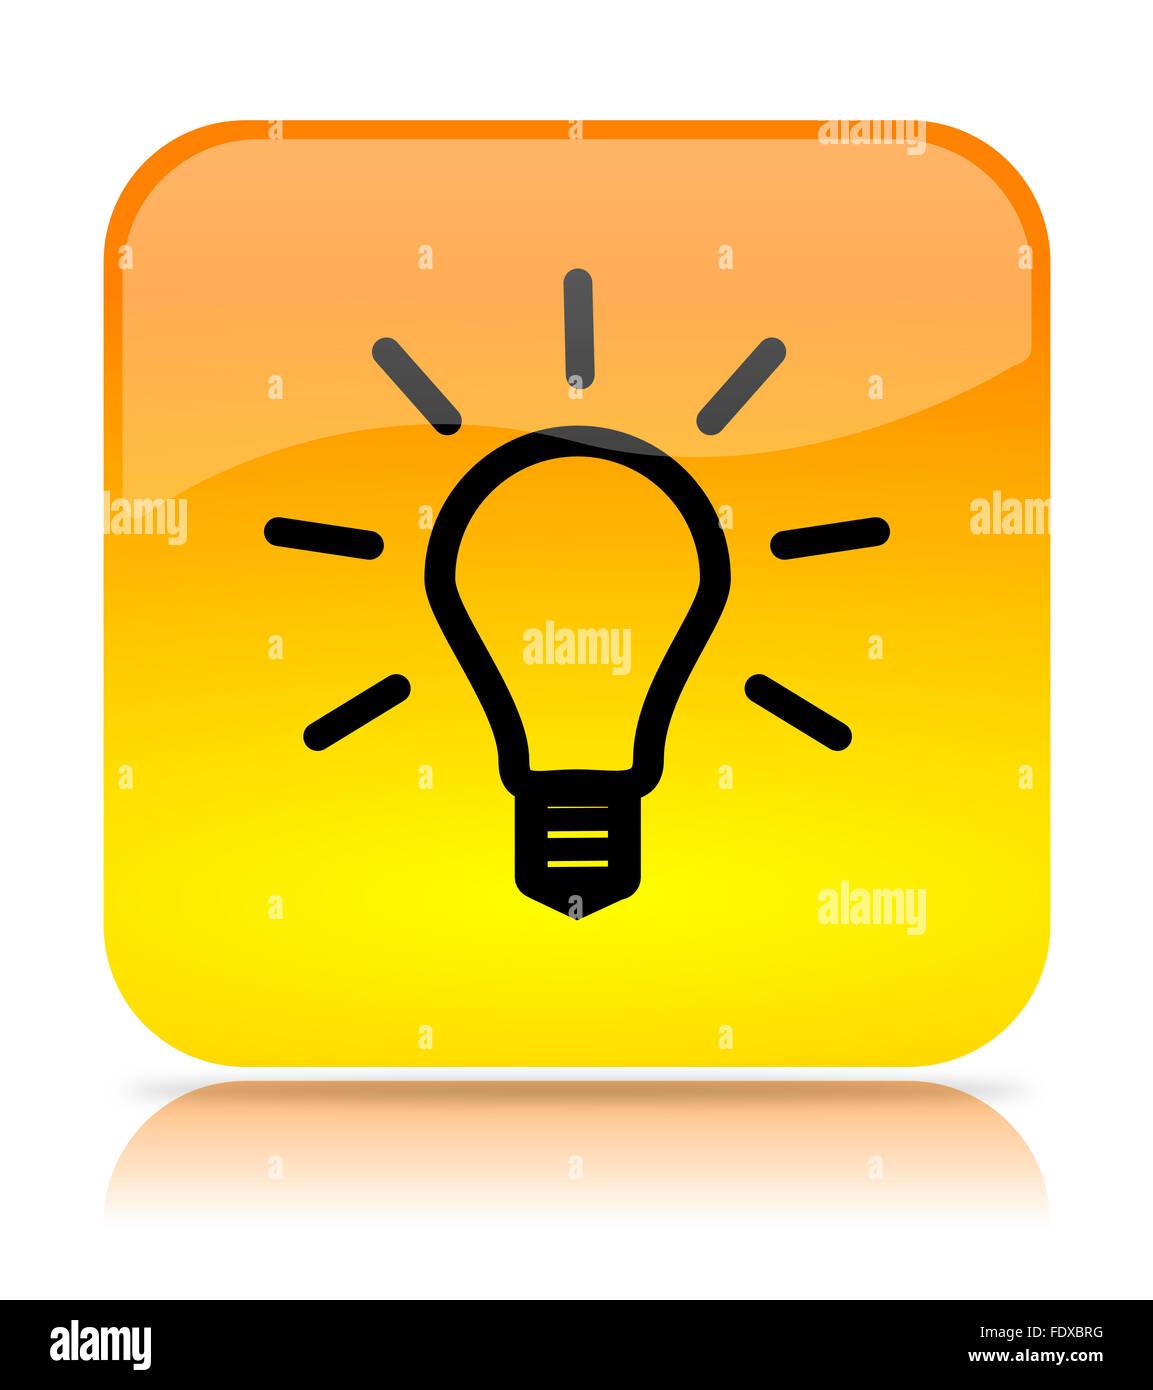 Icon lighting Light Bulb Yellow Light Bulb App Icon Illustration On White Background Behance Yellow Light Bulb App Icon Illustration On White Background Stock